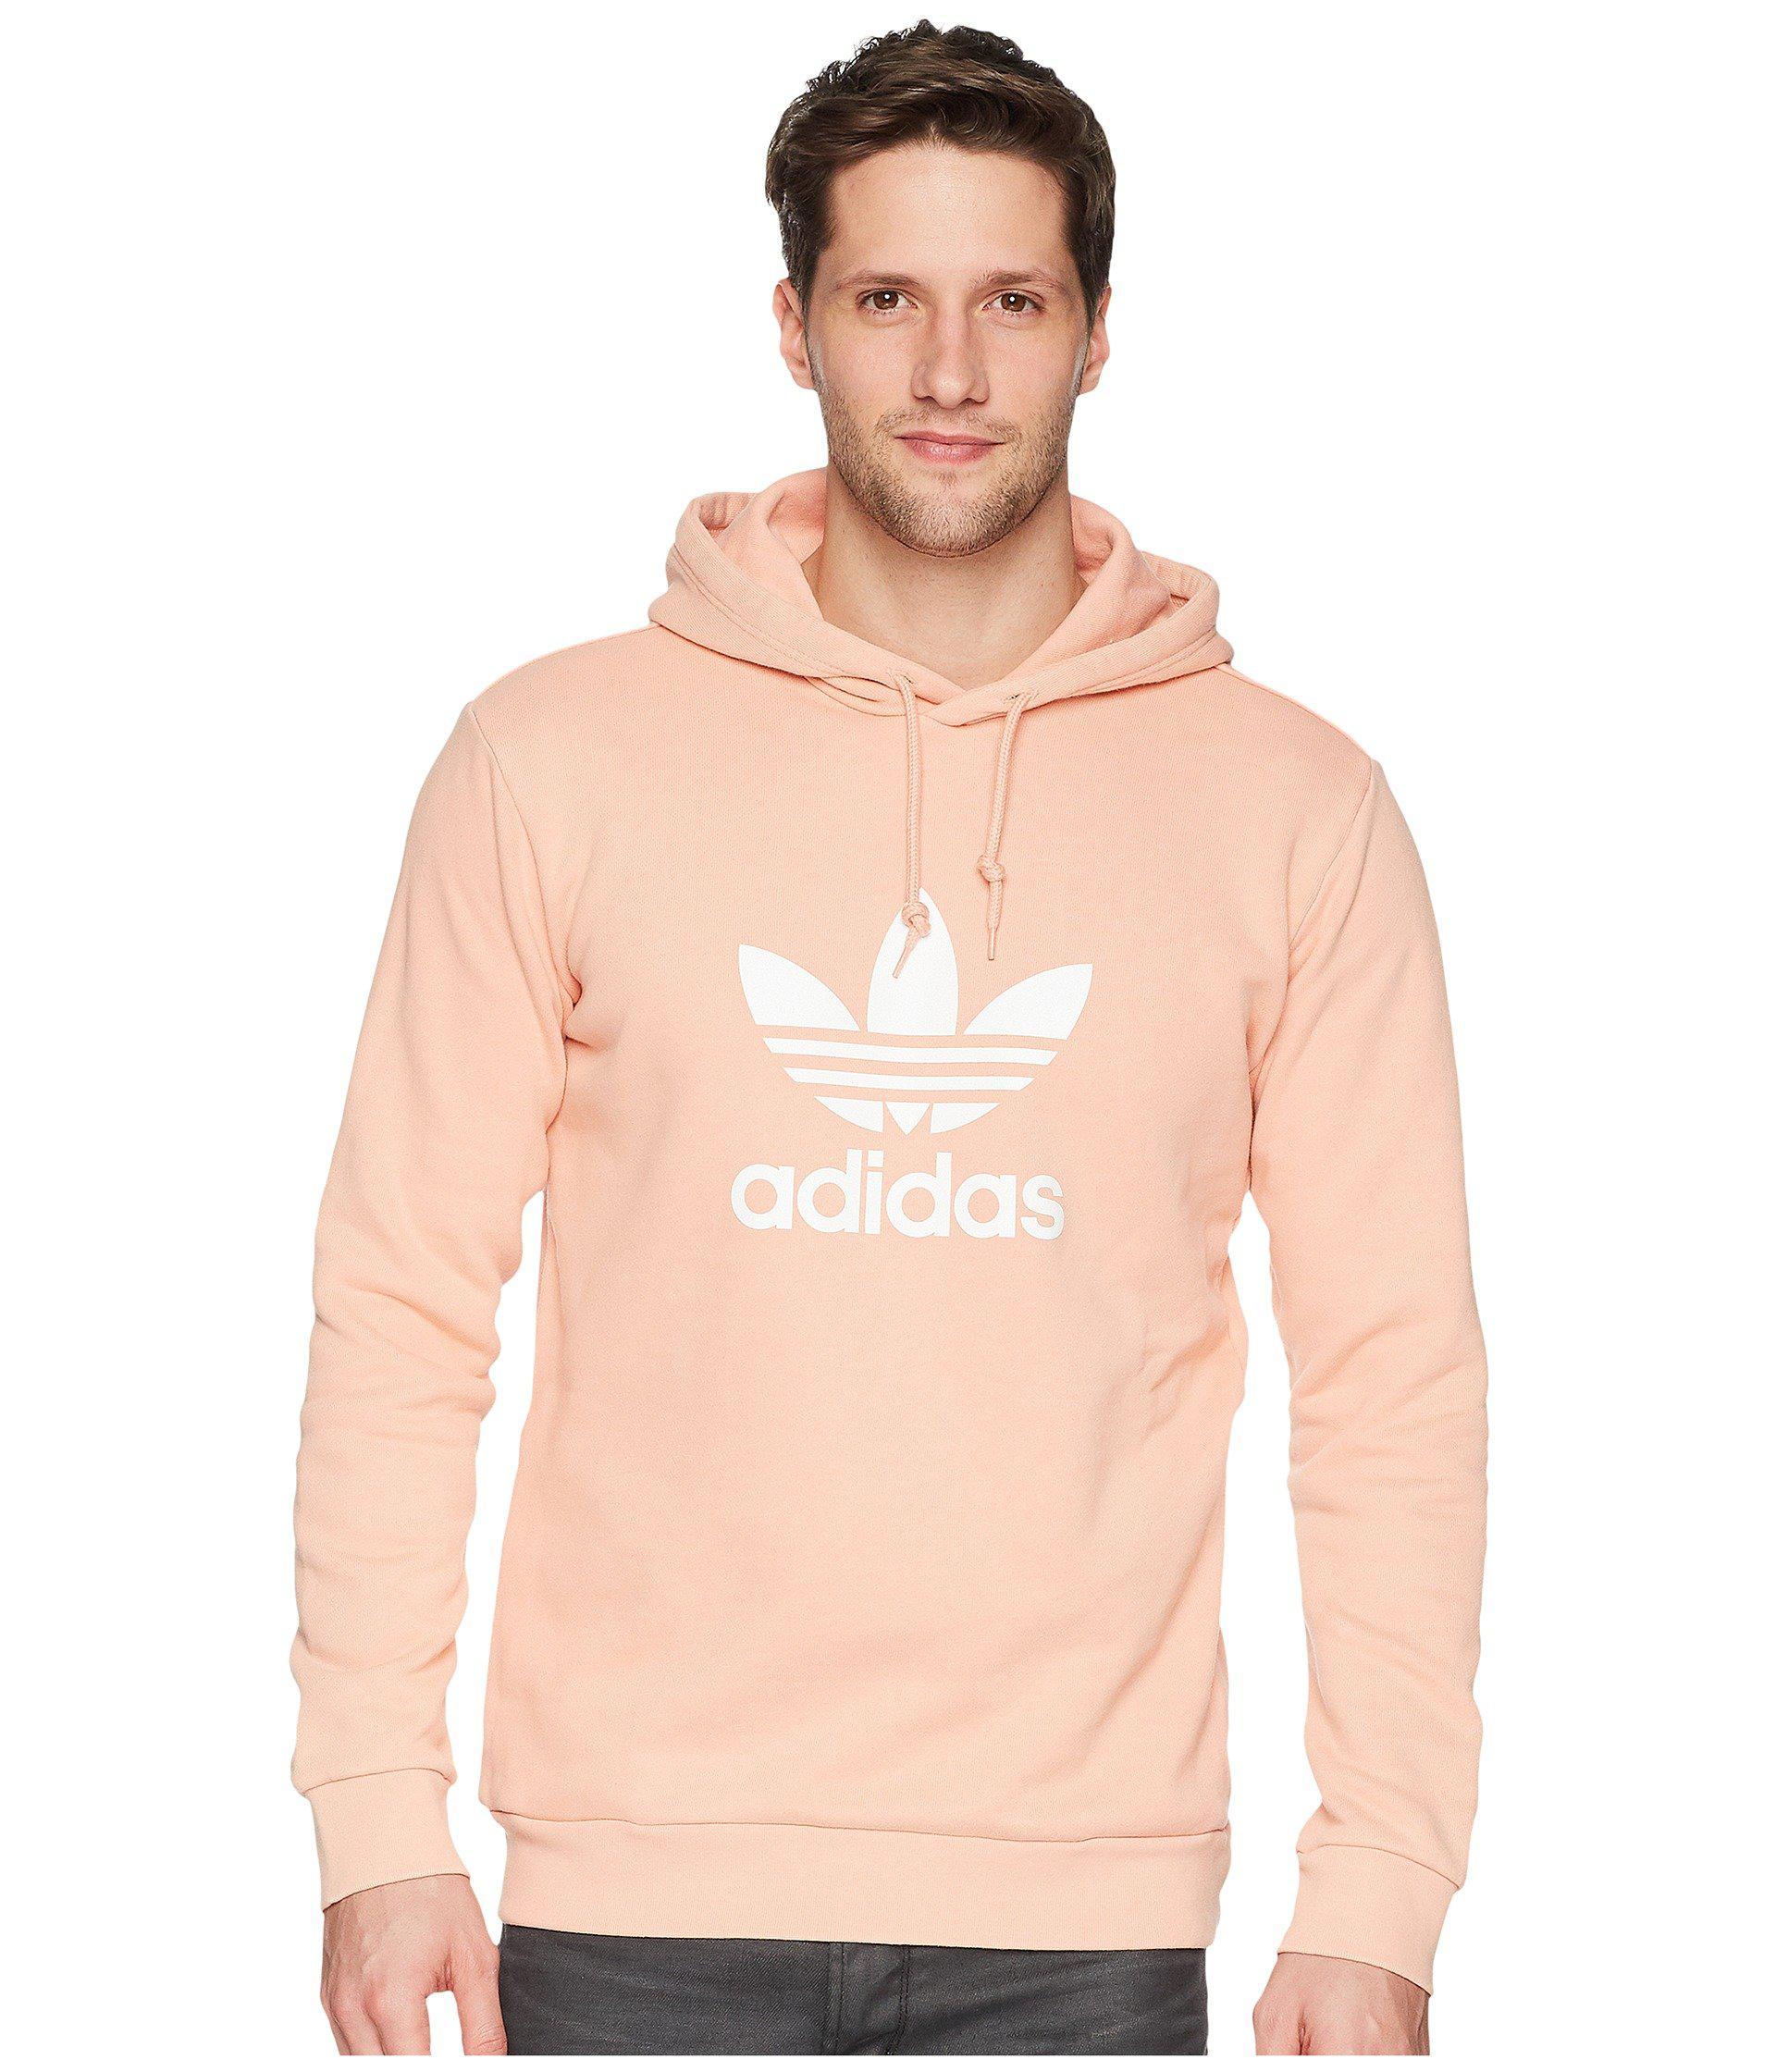 Lyst - Adidas Originals Trefoil Warm-up Hoodie in Pink for Men c4a05dfcc2